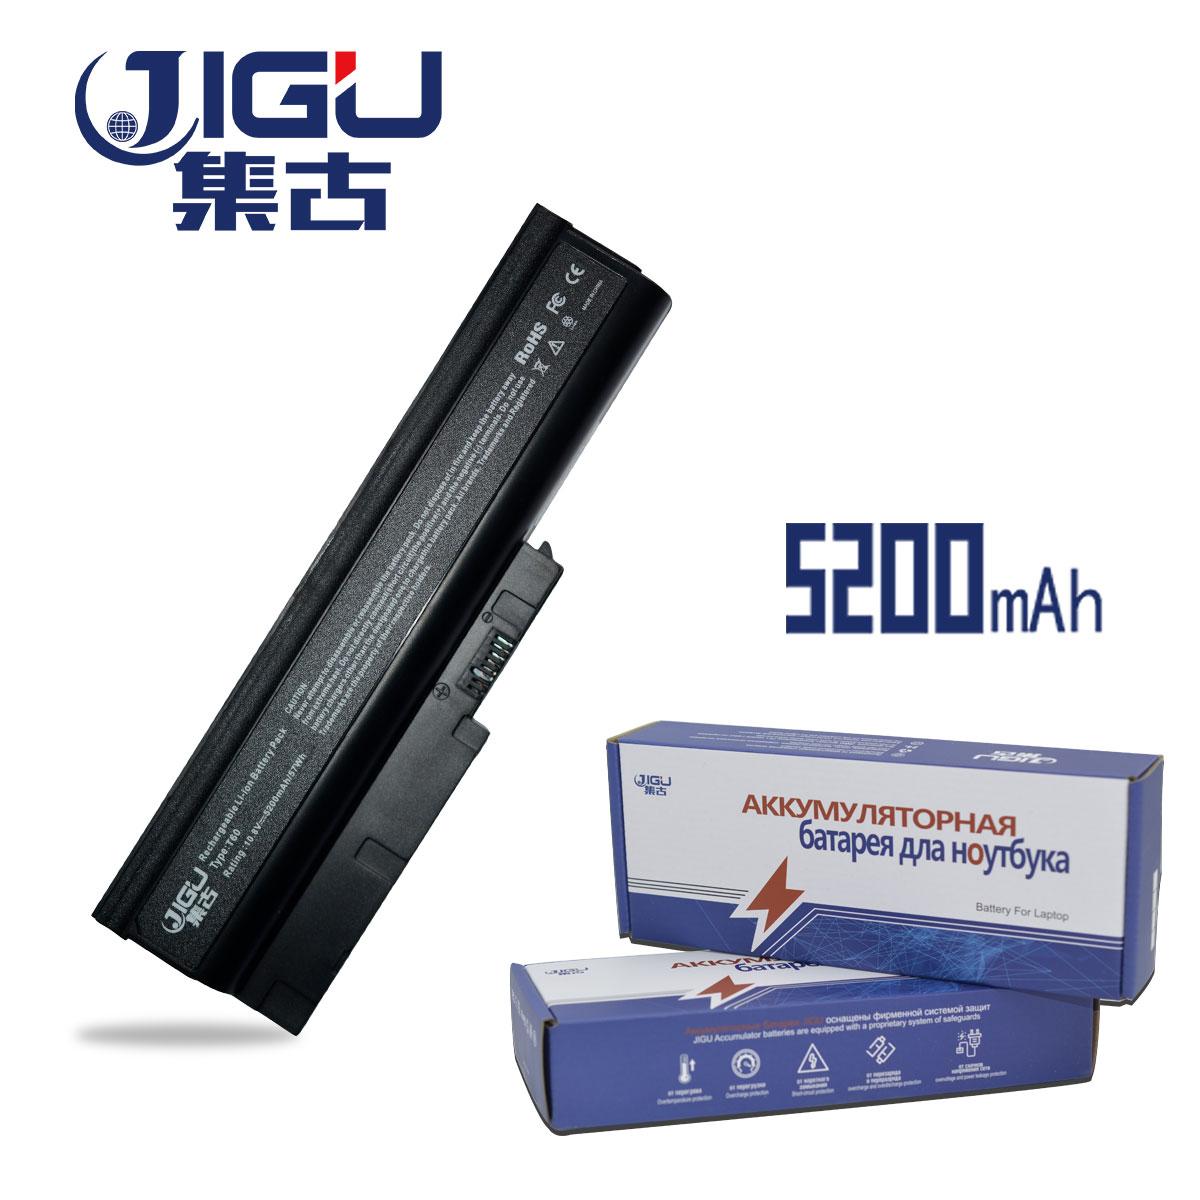 92P1138 JIGU Bateria Do Portátil Para ThinkPad R60 R60e R61 R61e R61i T60 T60p T61 T61p R500 T500 W500 SL400 SL500 SL300